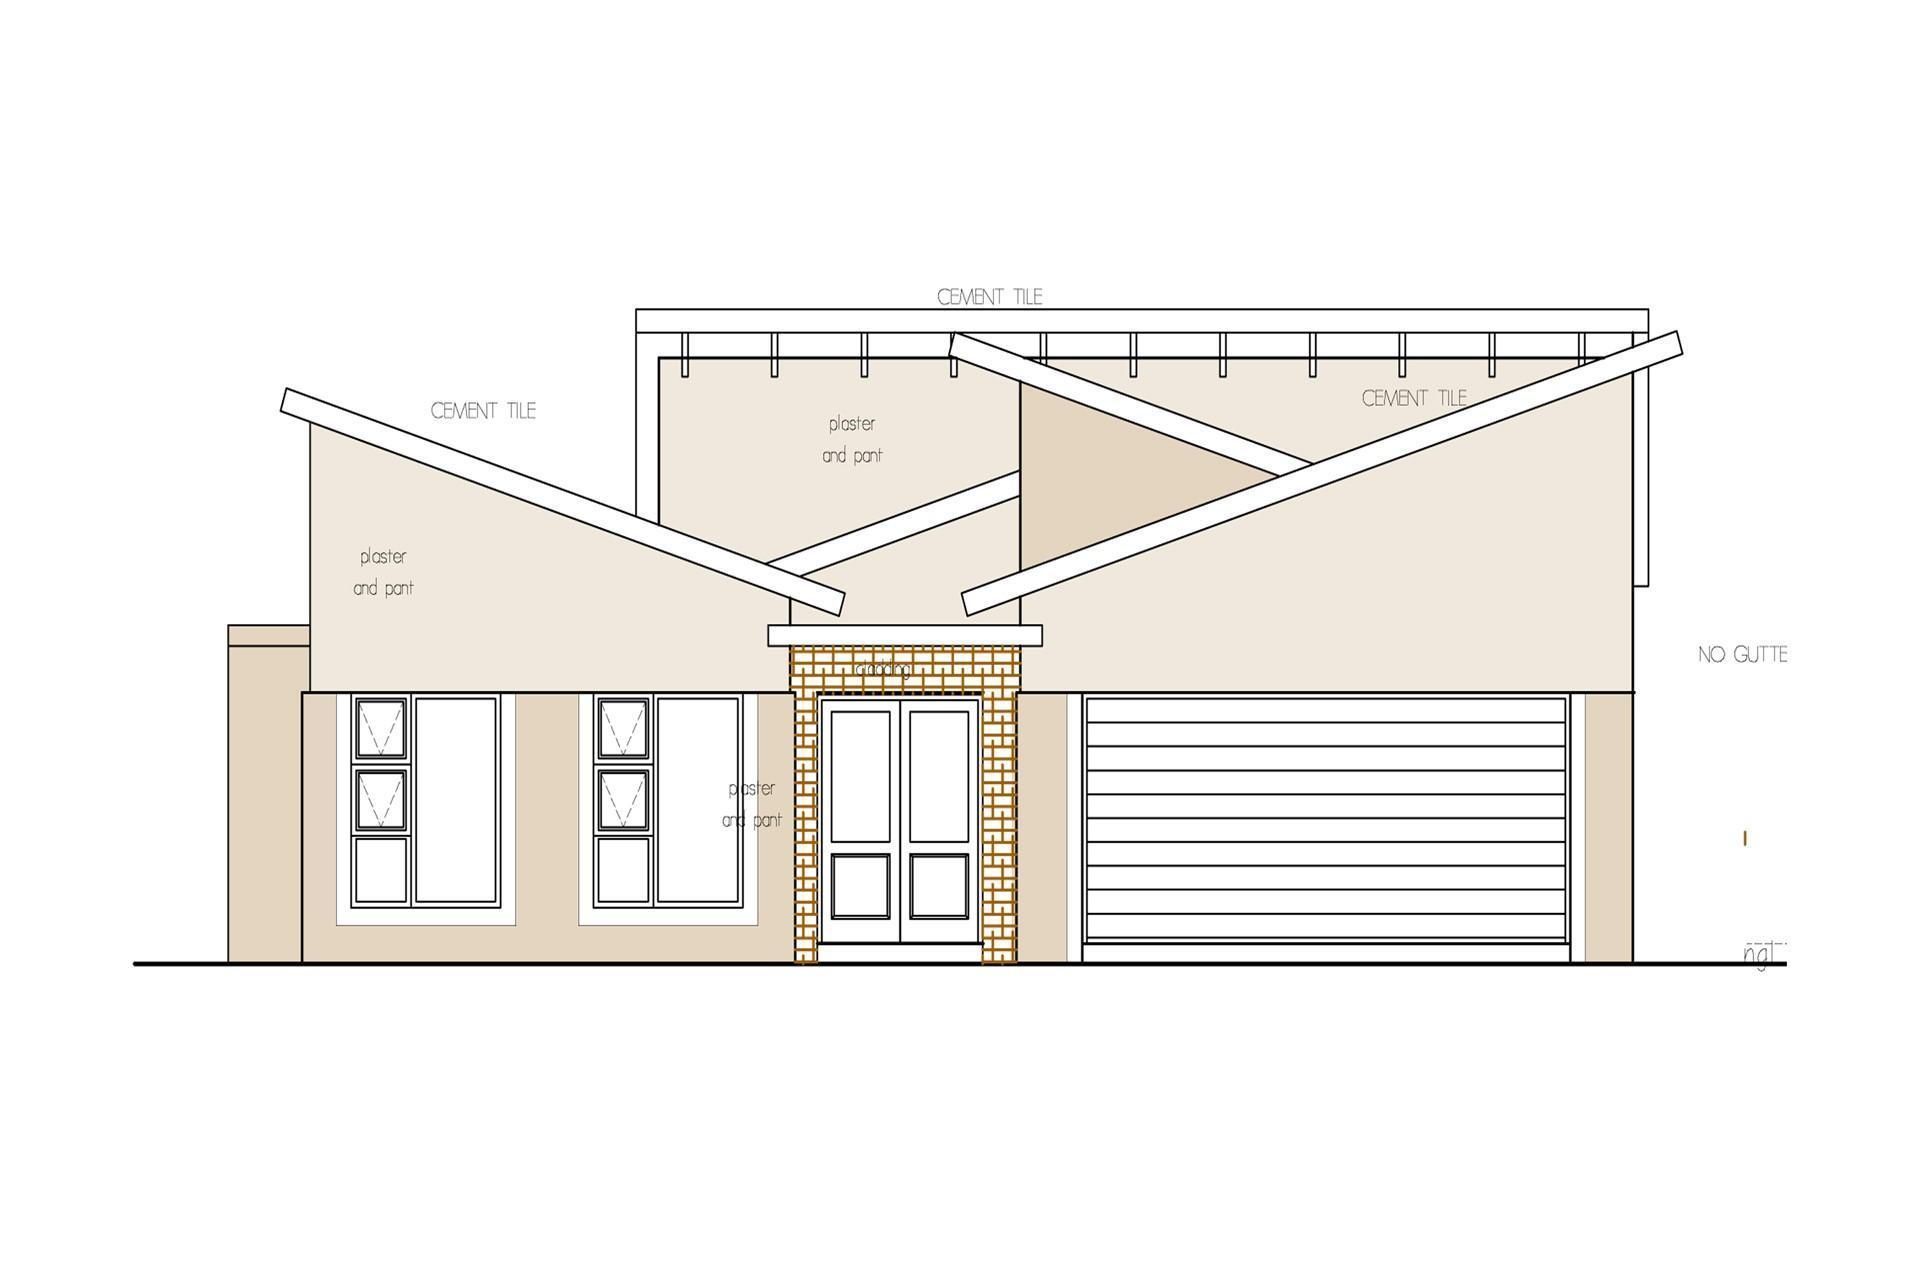 Find floor plans by address 28 images find house plans for Find floor plans by address